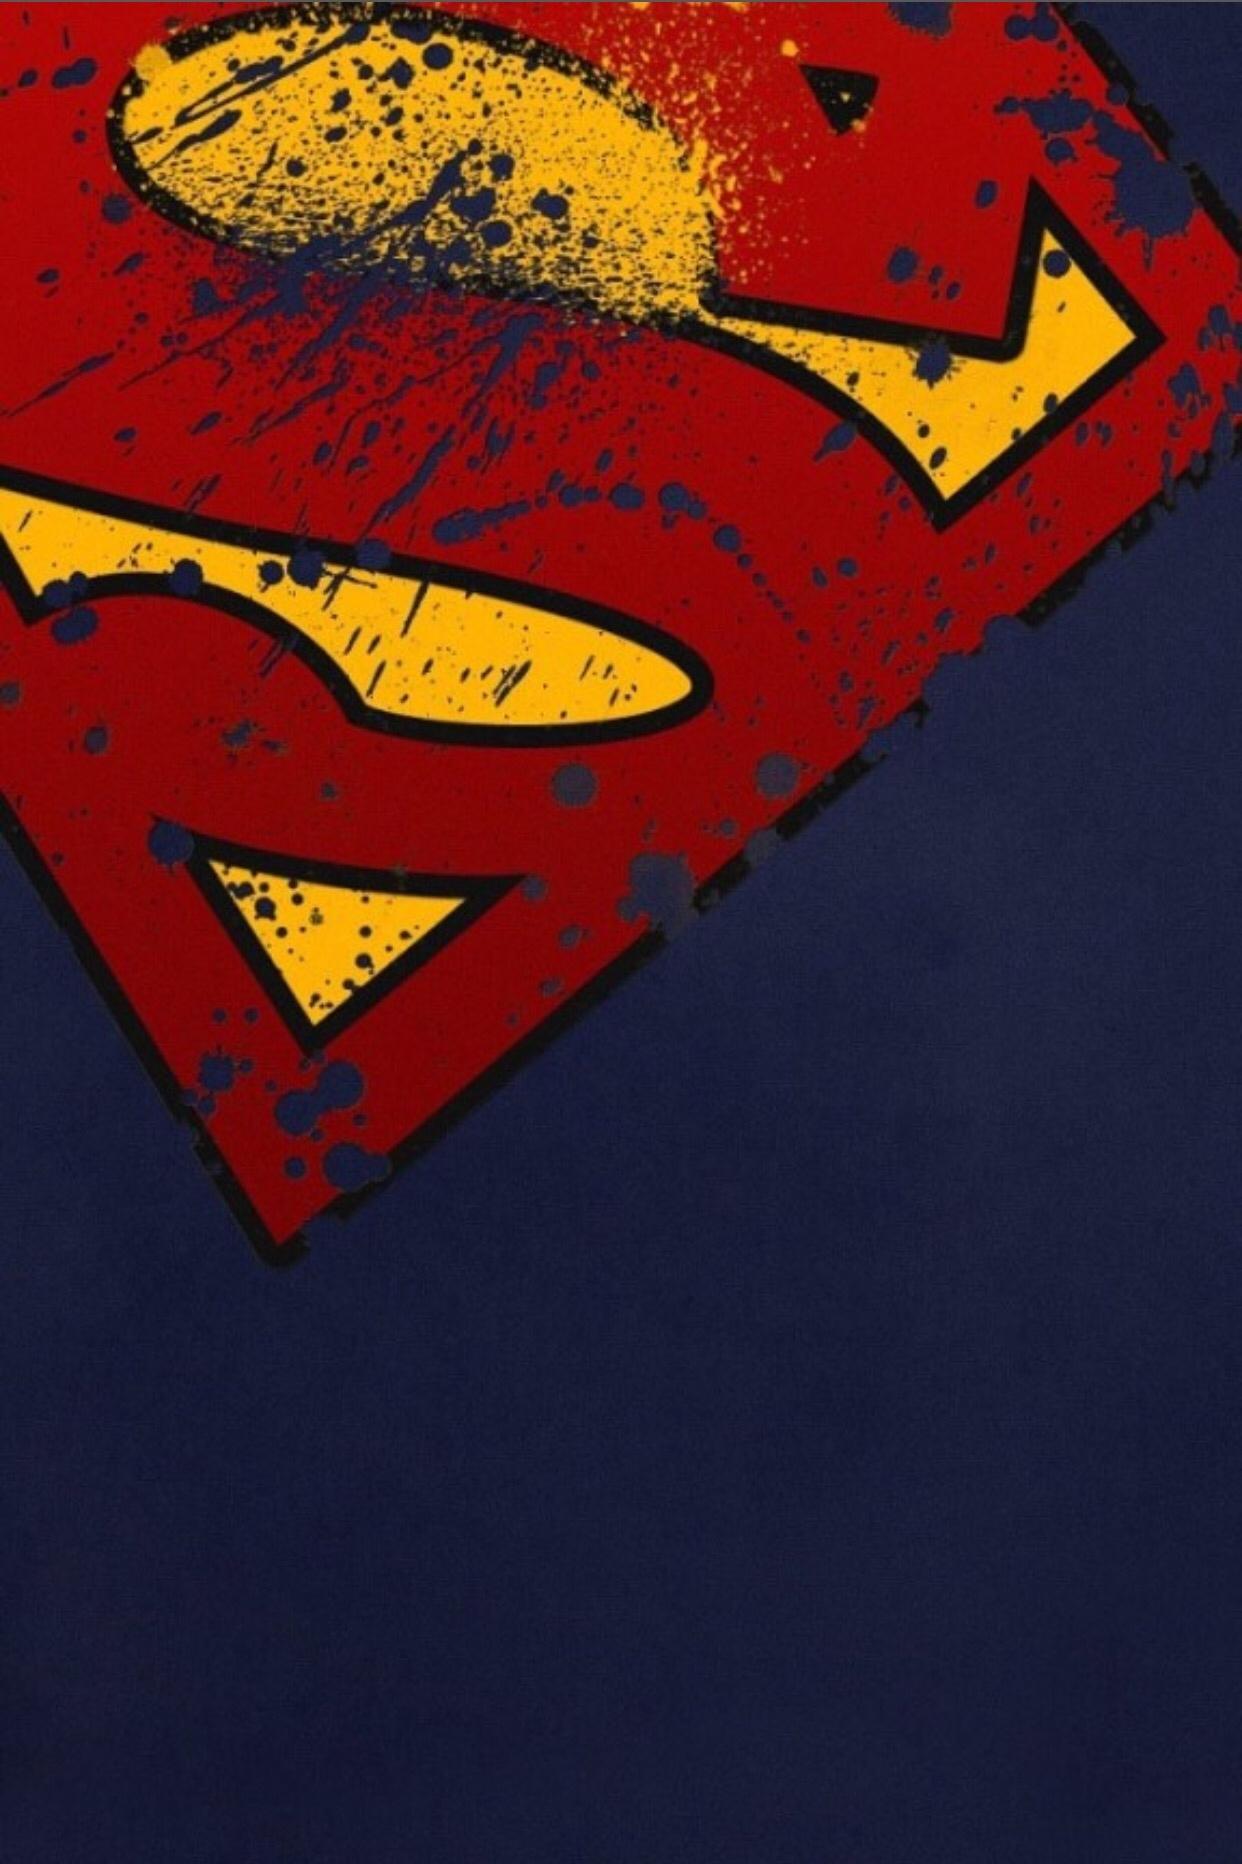 superman wallpaper | wallpapers | pinterest | superman wallpaper